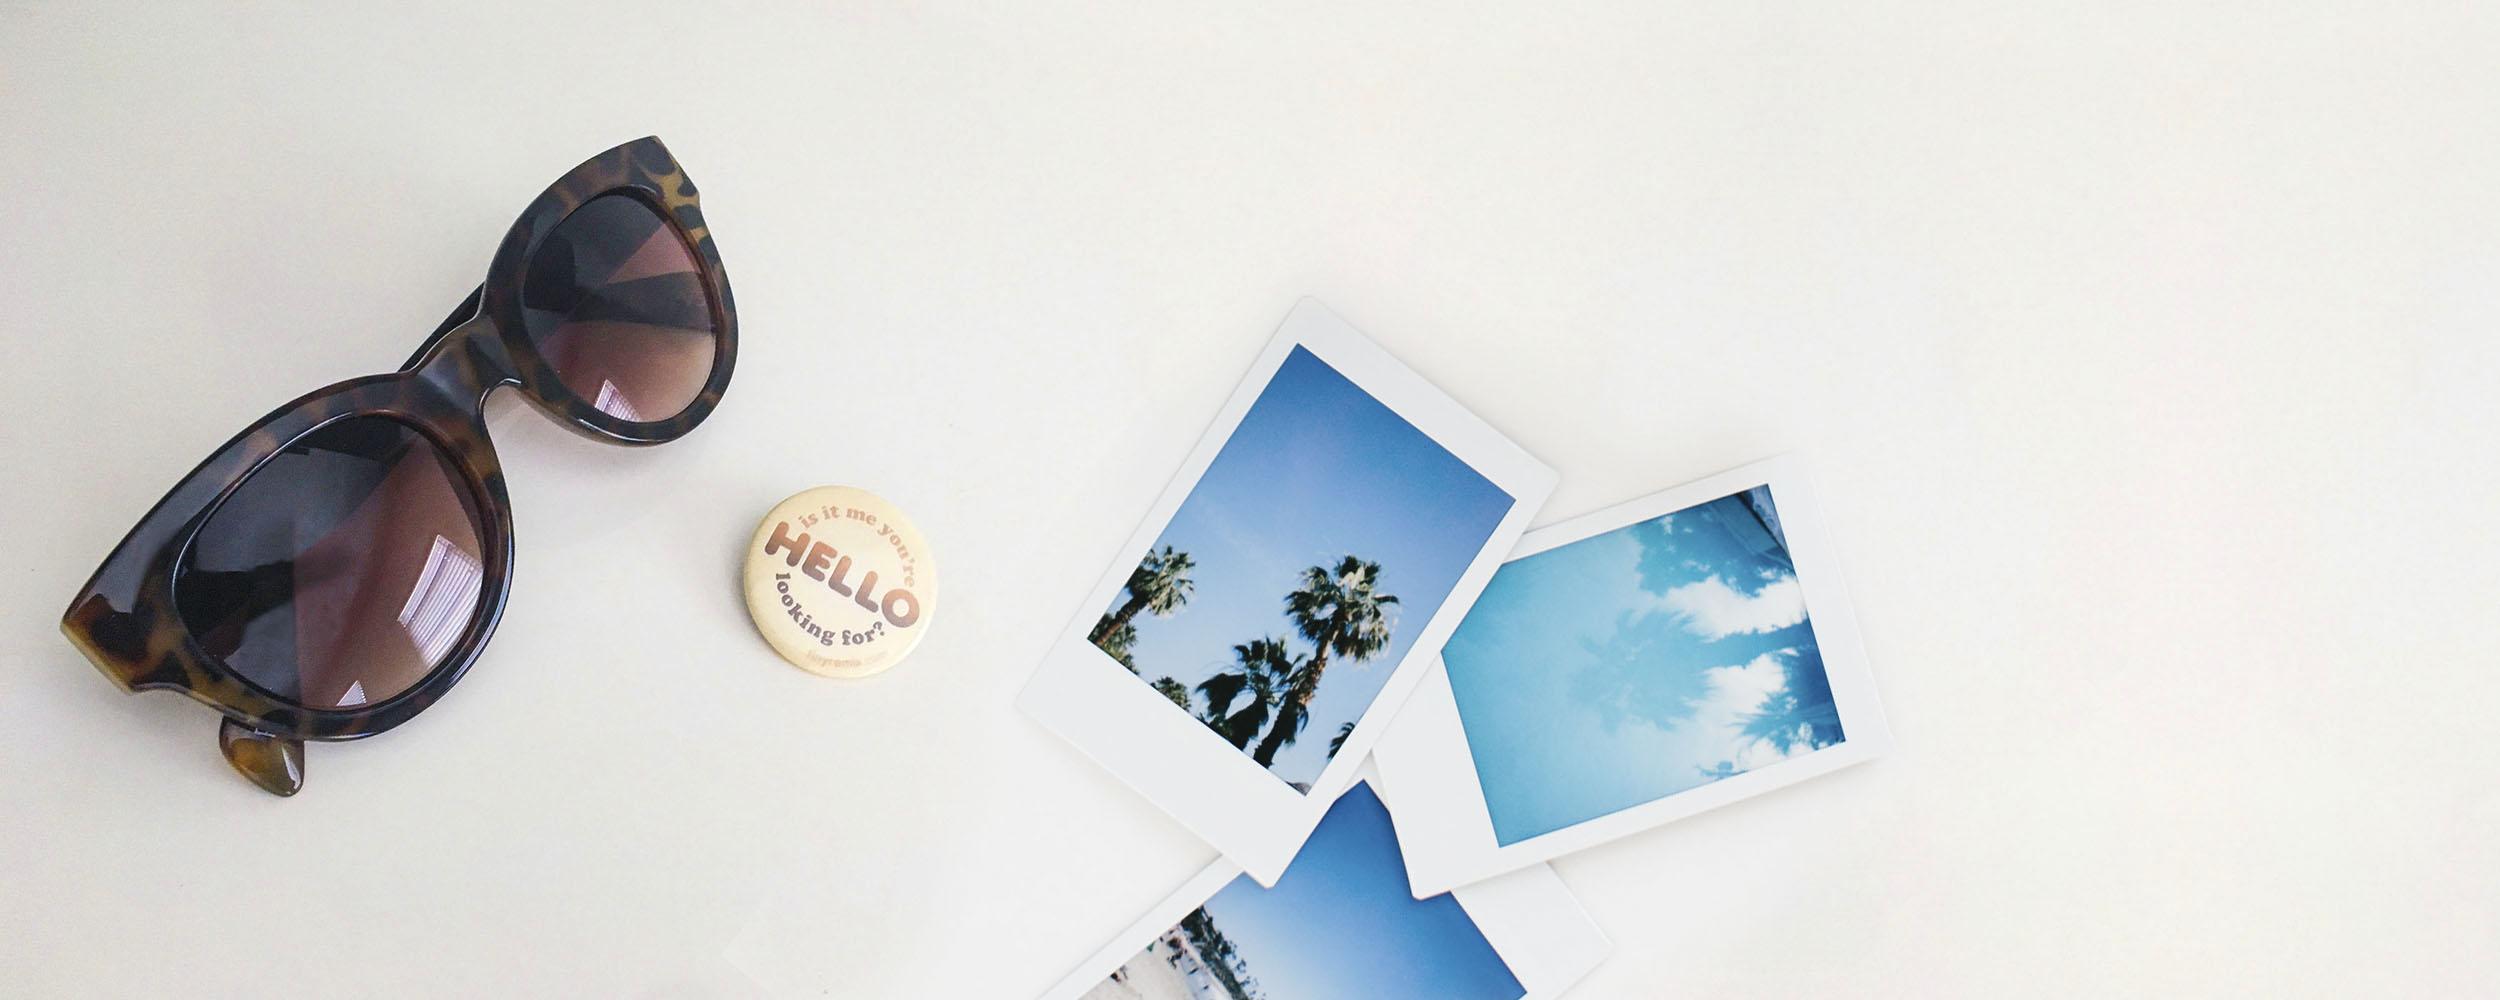 Serina-Morris-sunglasses-hello-pin-photos-long.jpg